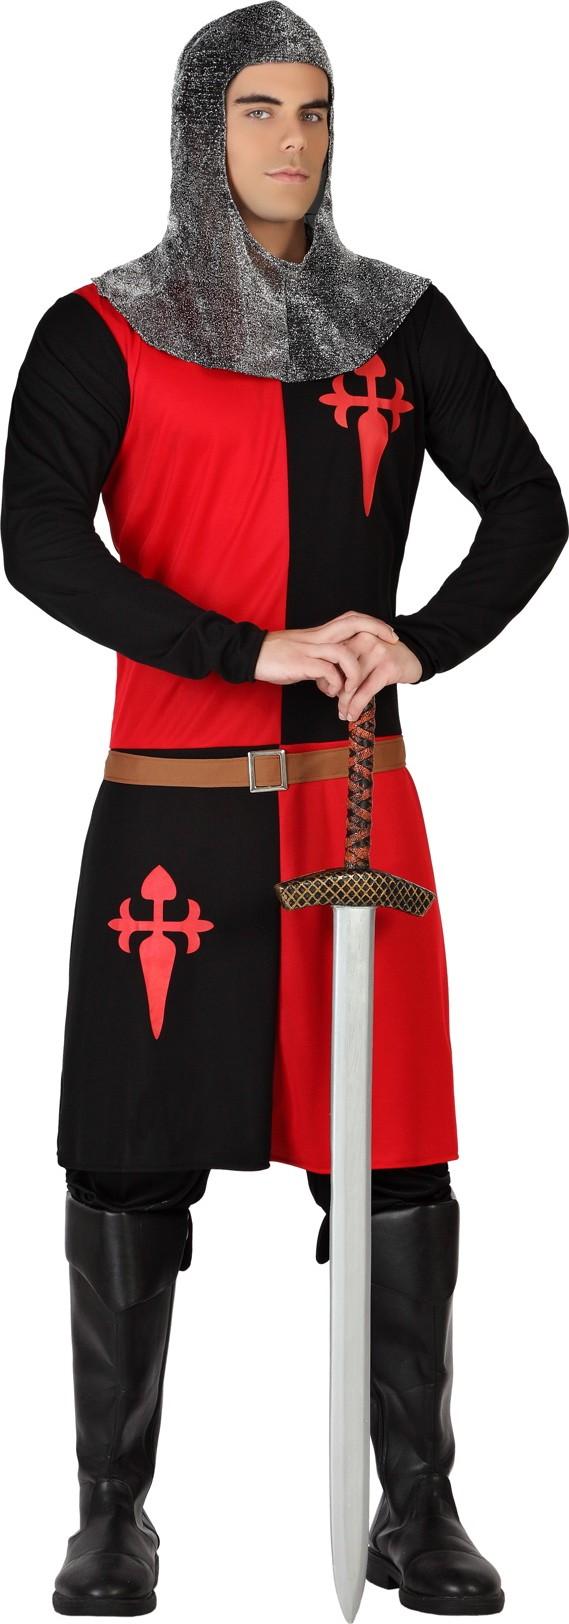 deguisement chevalier